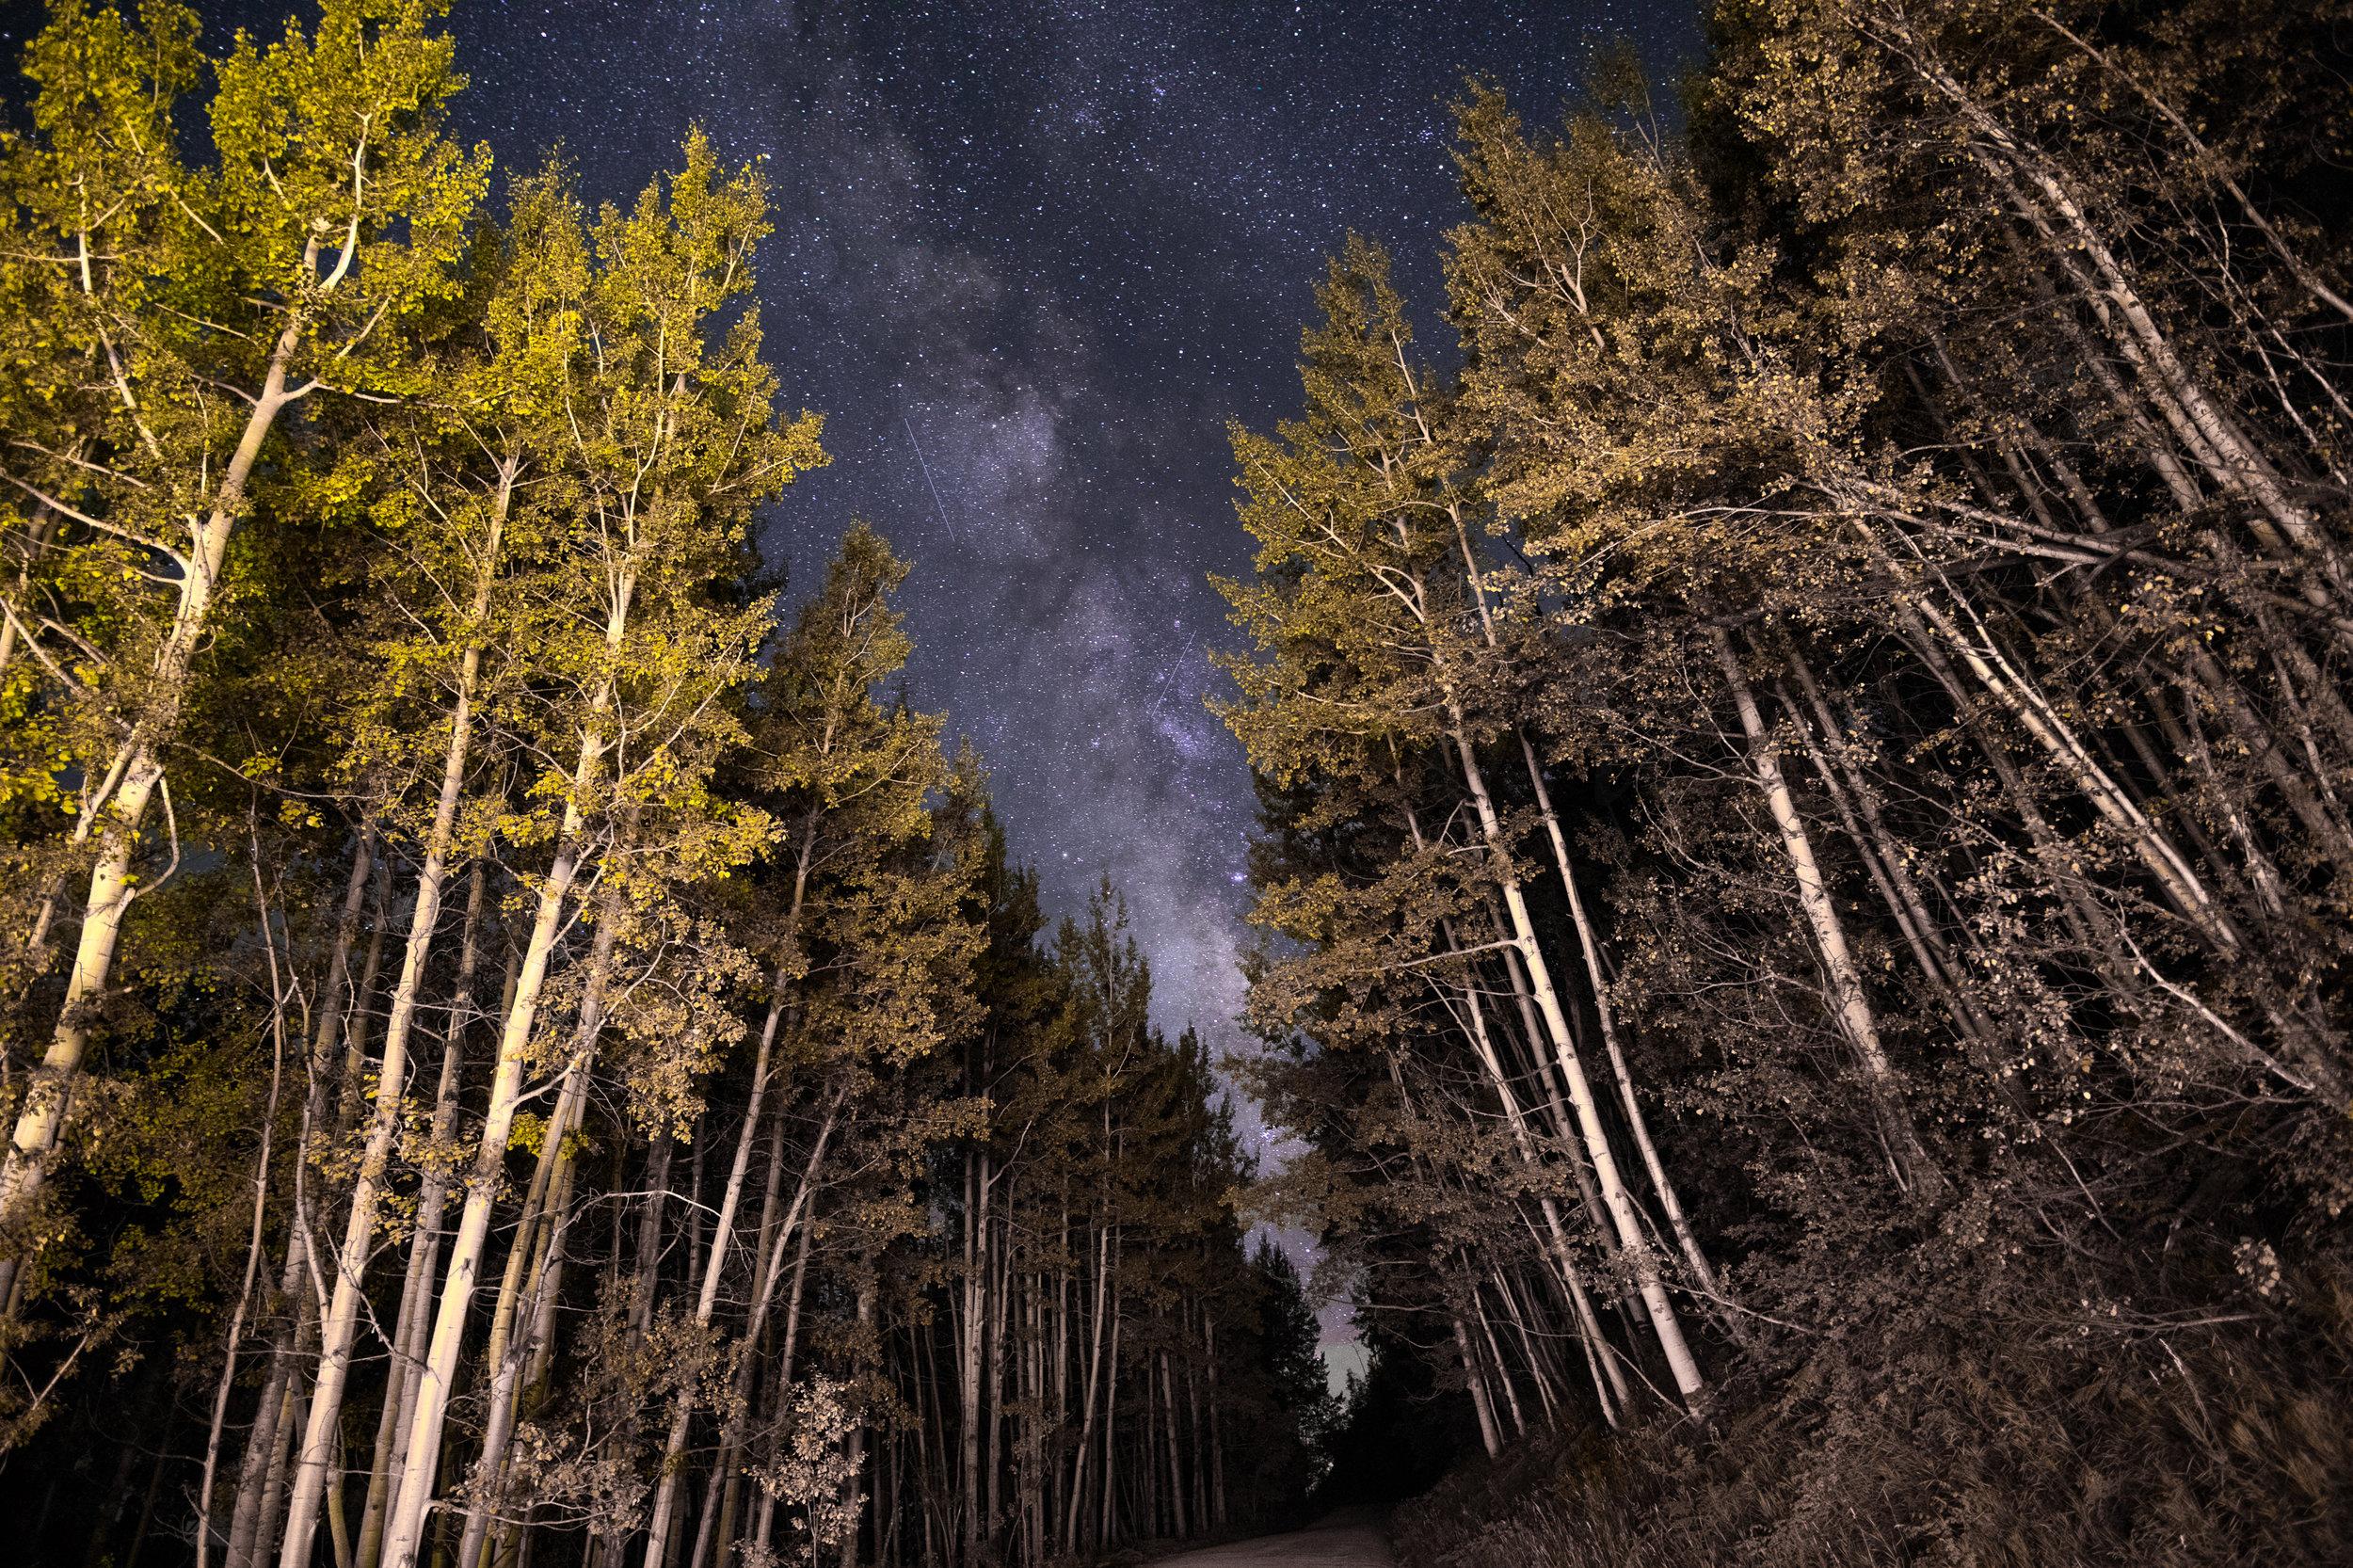 Purgatory Milky Way, Image # 7600